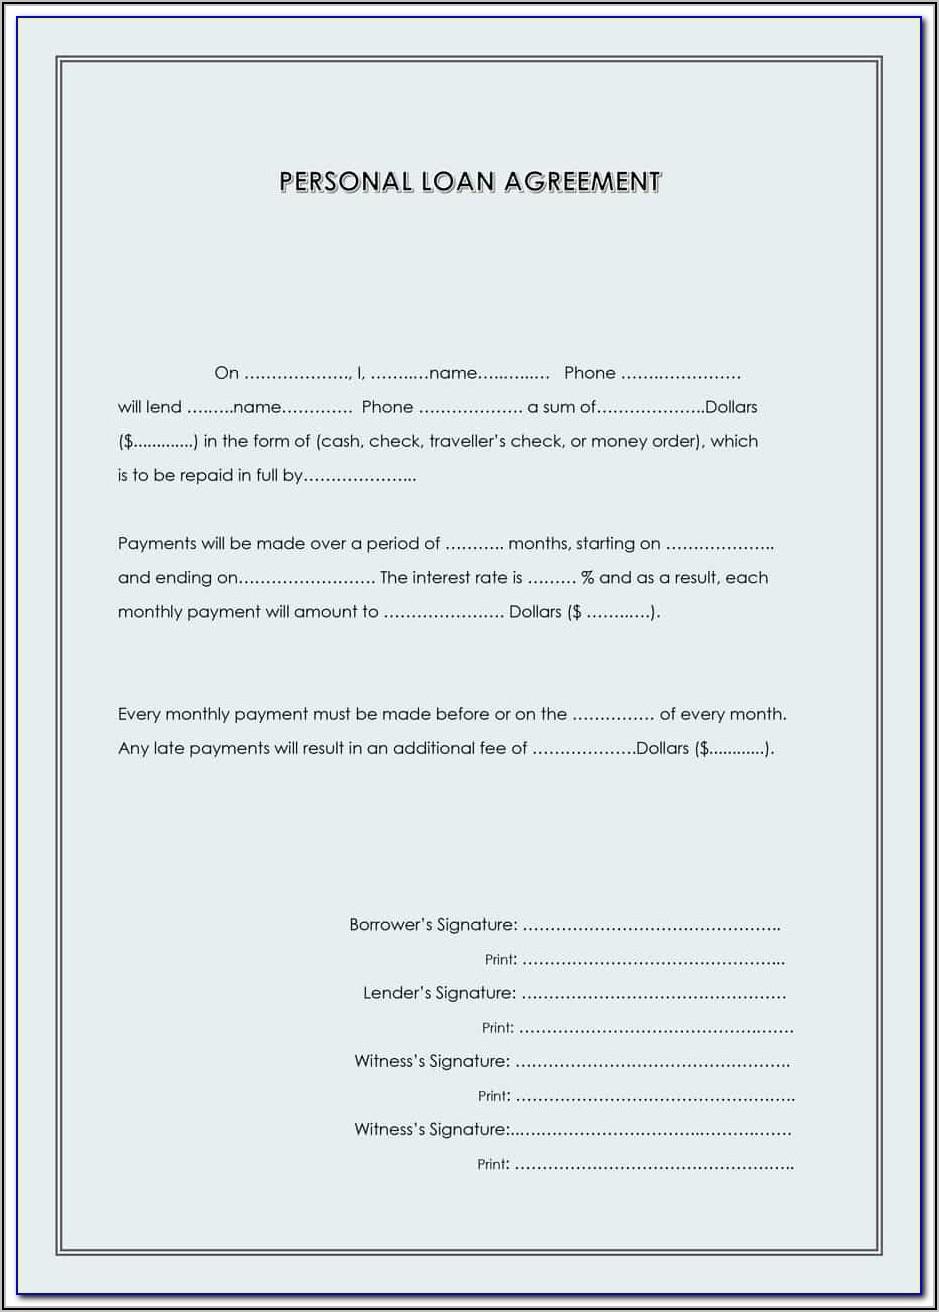 Personal Loan Agreement Template Australia Free